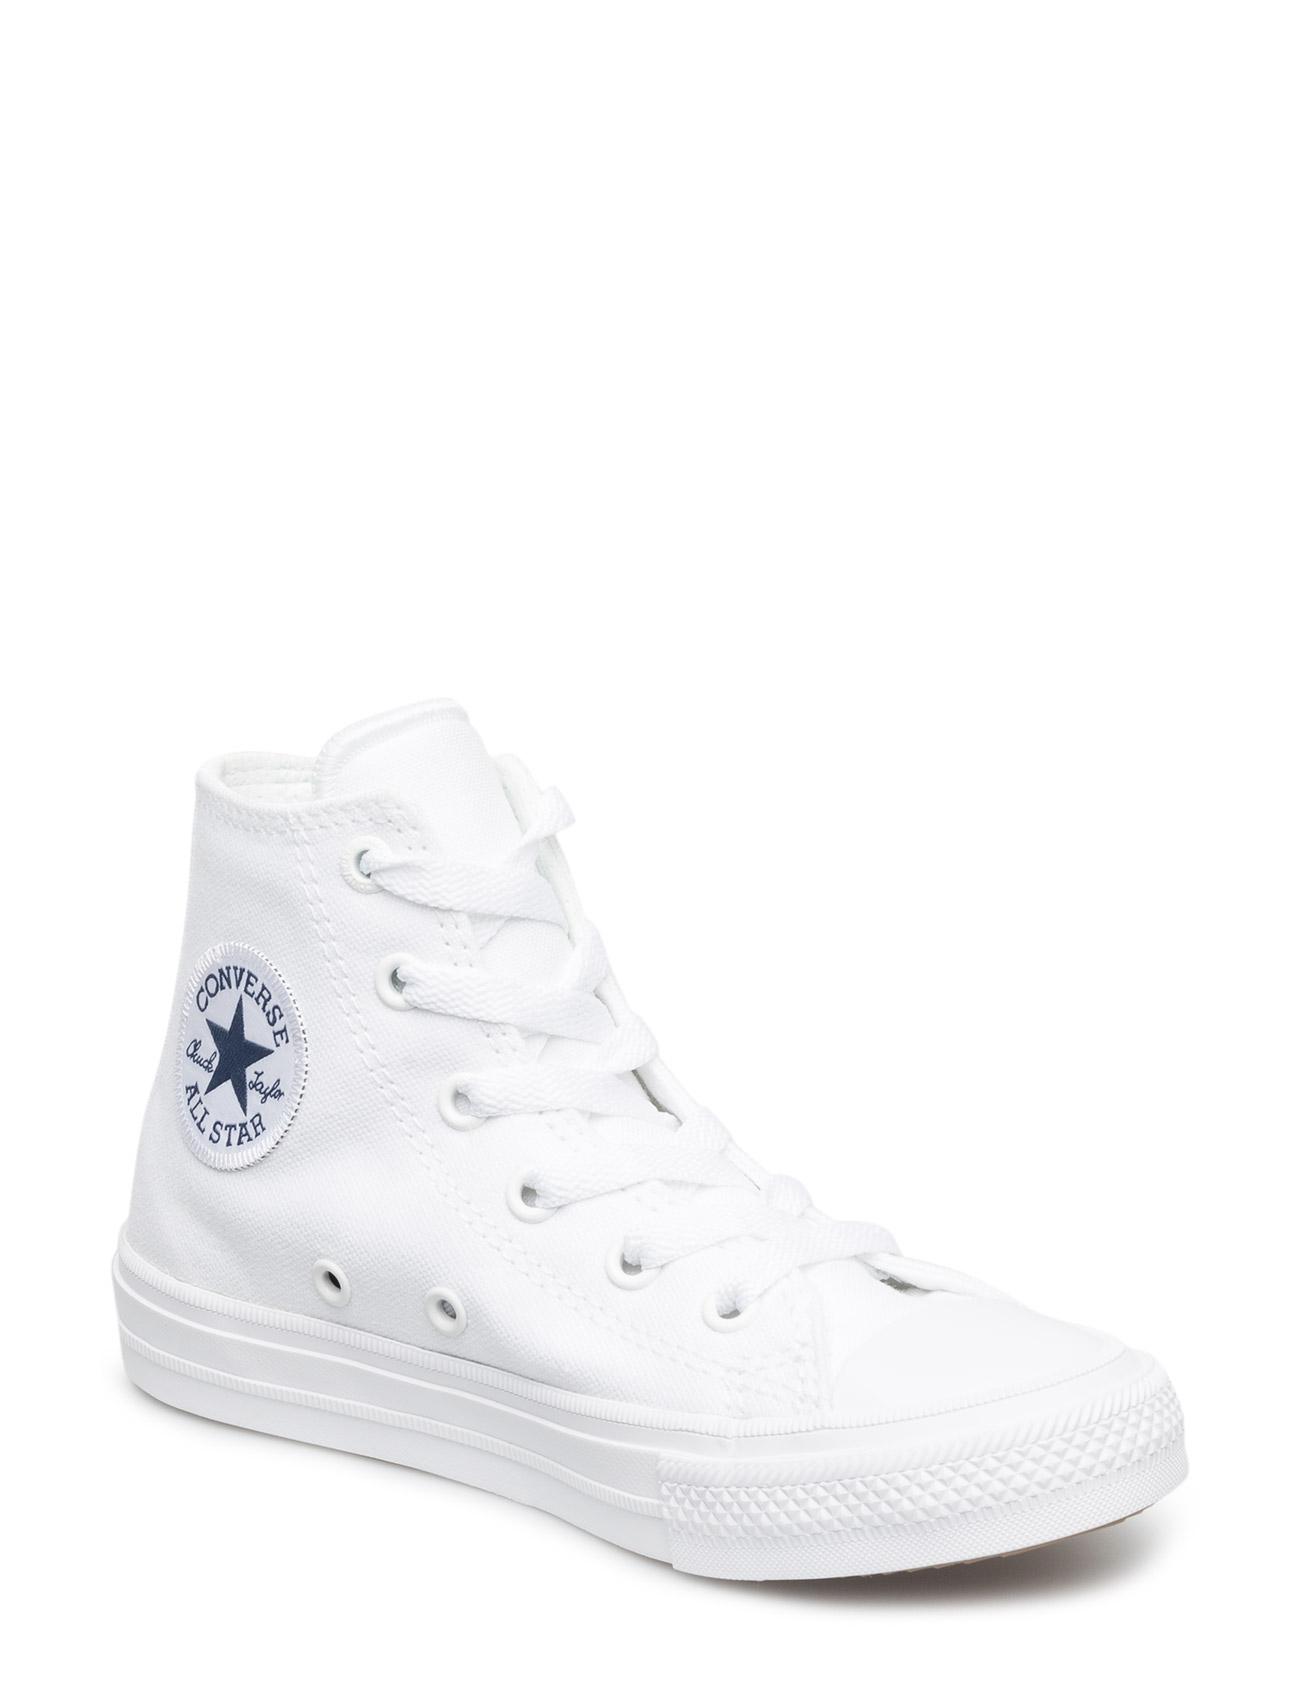 Ctas Ii Hi White/White/Navy Converse Sko til Børn i